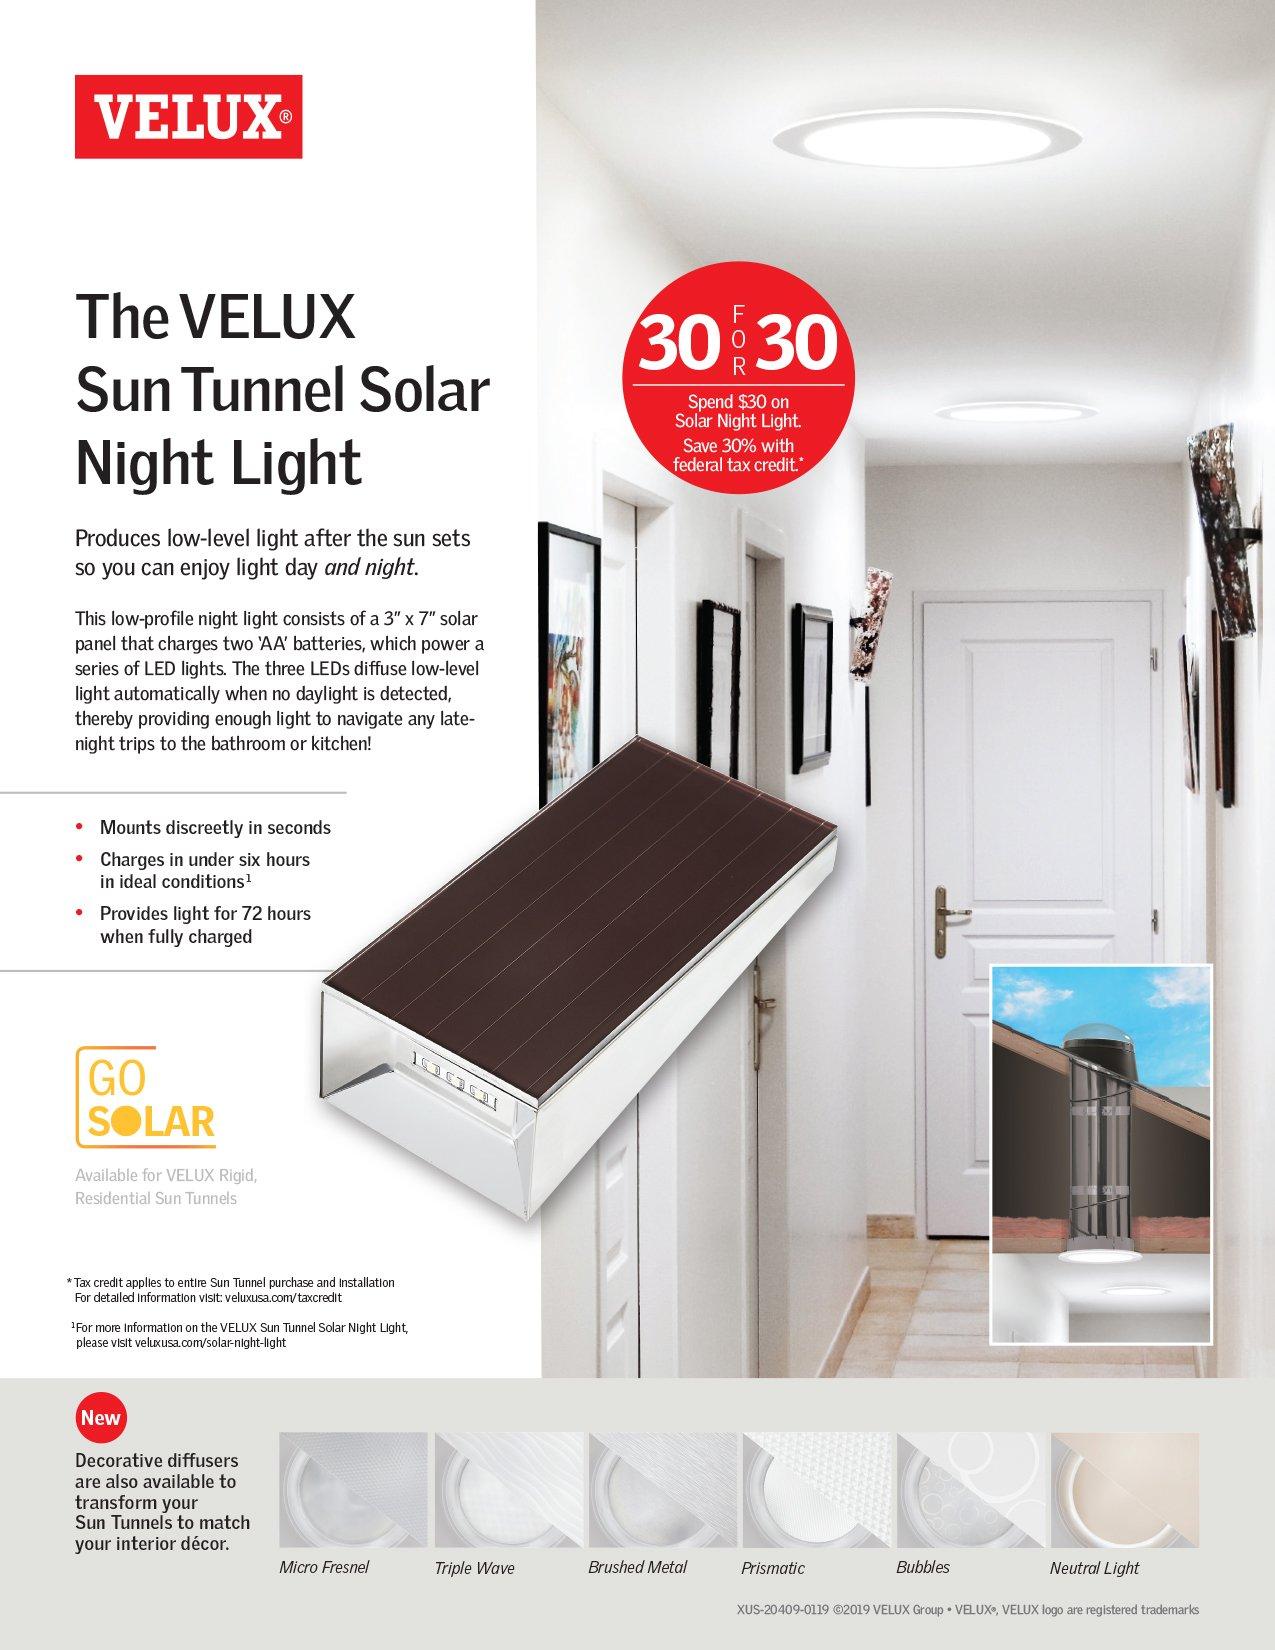 xus-20409-sun-tunnel-solar-night-light-flyer-0119-1